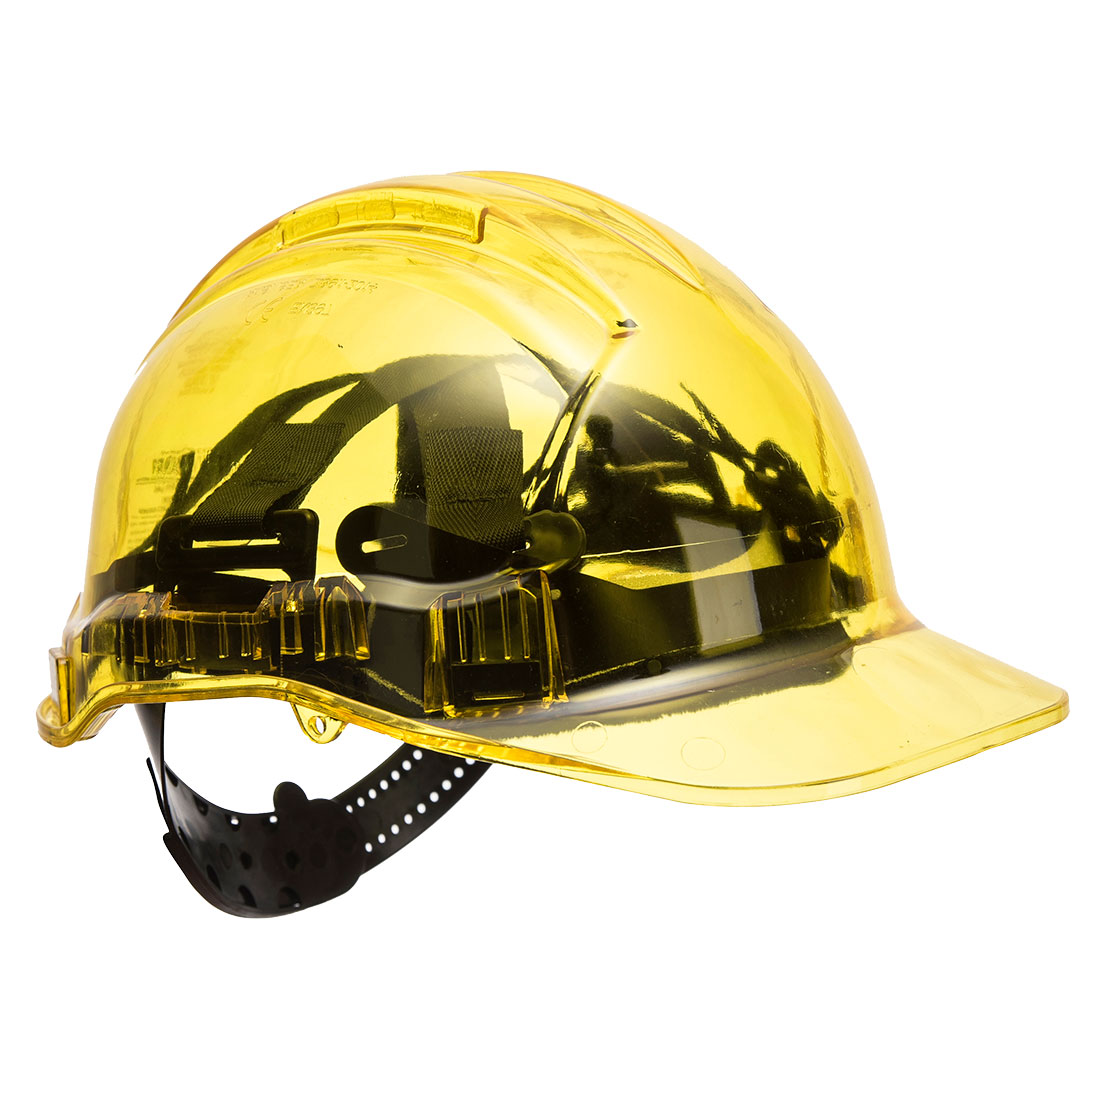 Peak View Plus Helmet Yellow